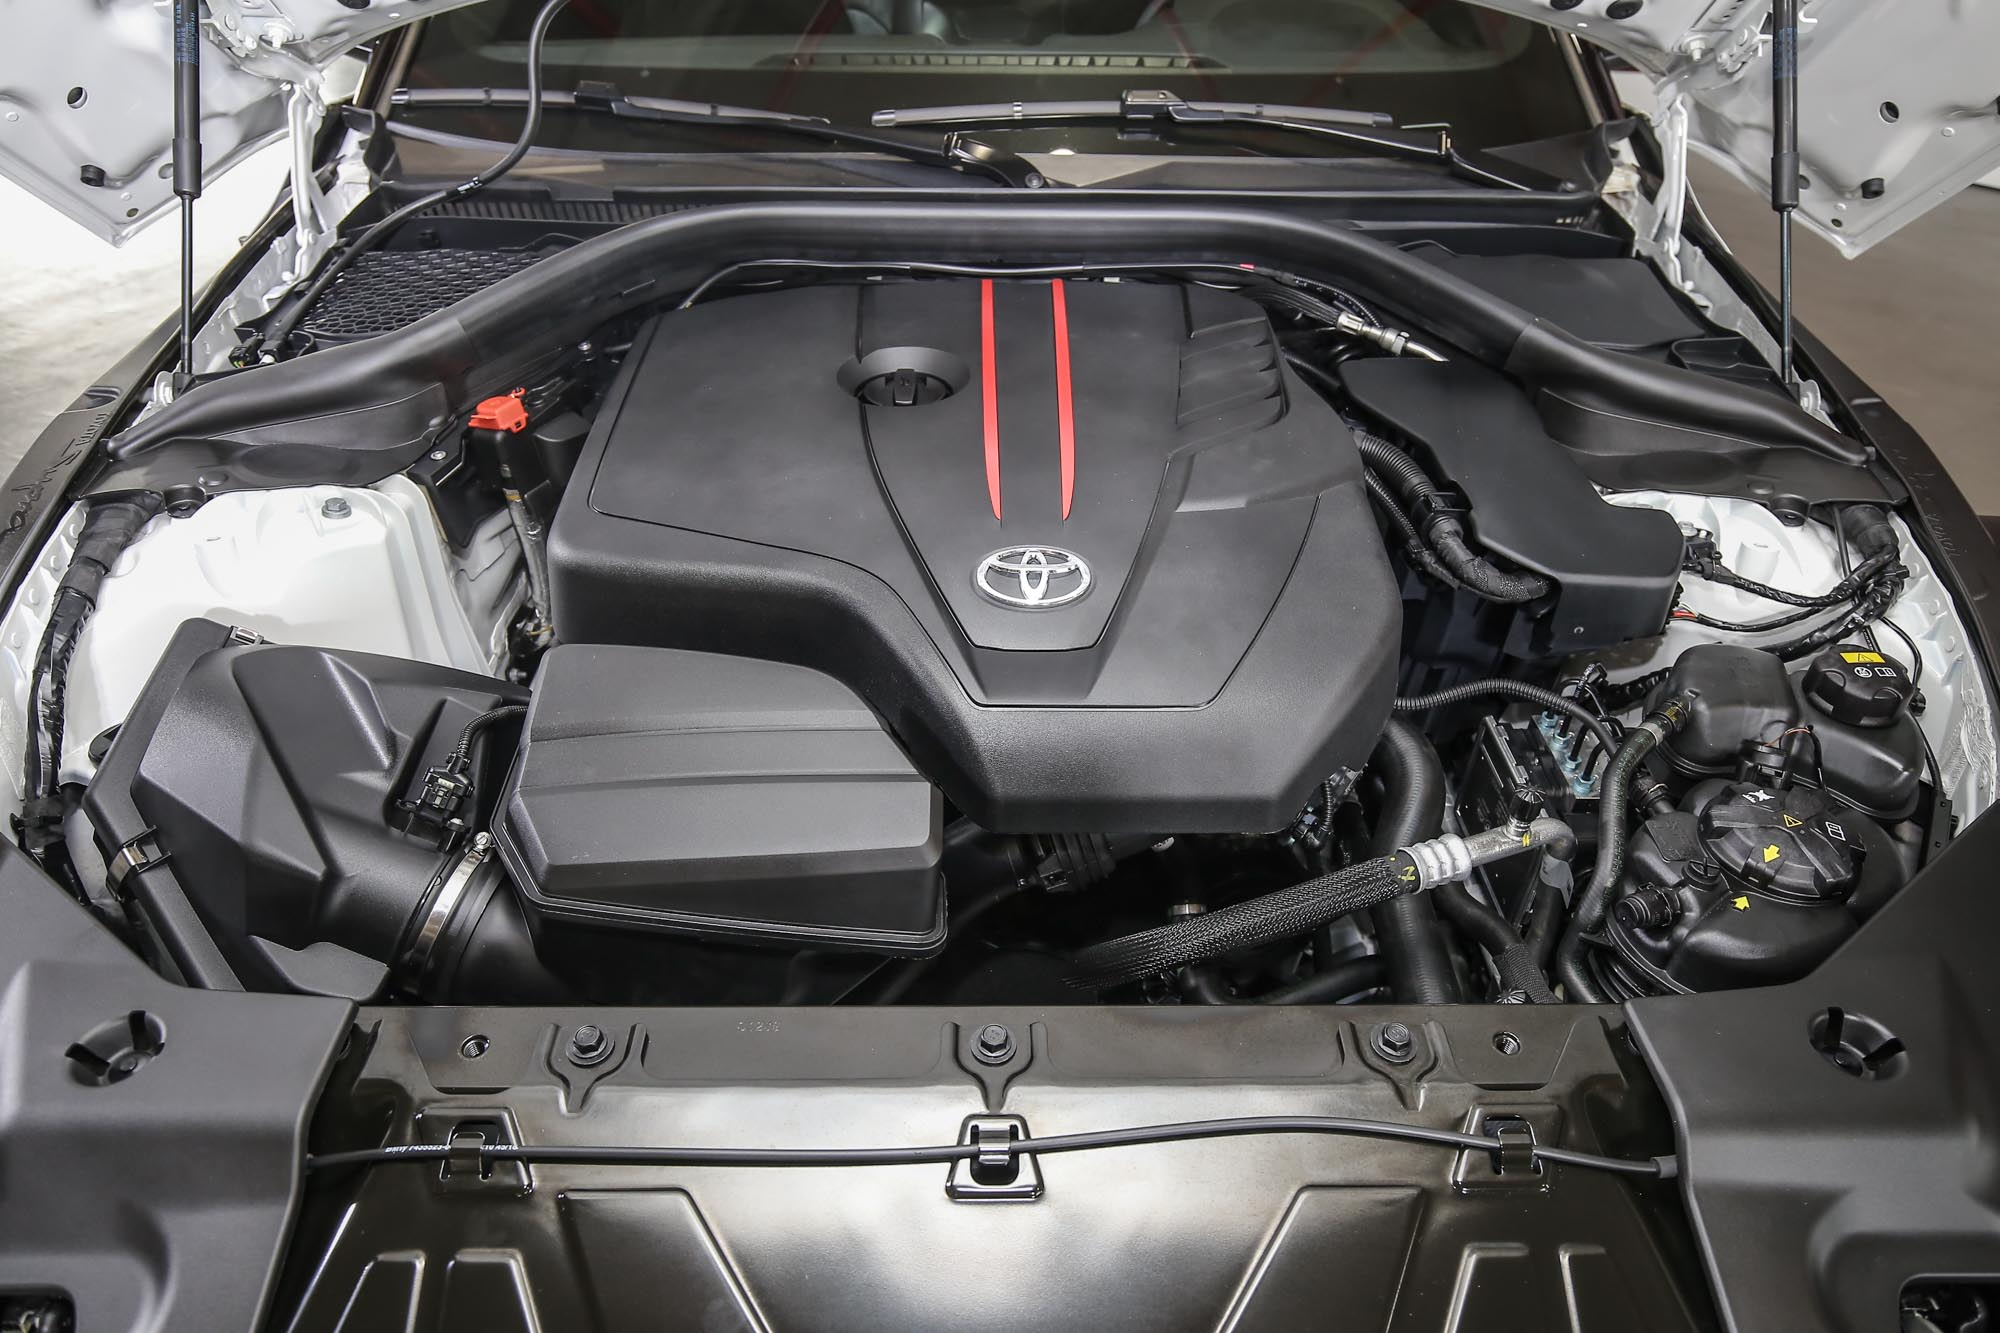 2.0T 採用直四渦輪增壓引擎,具備 258 hp/40.8 kgm。